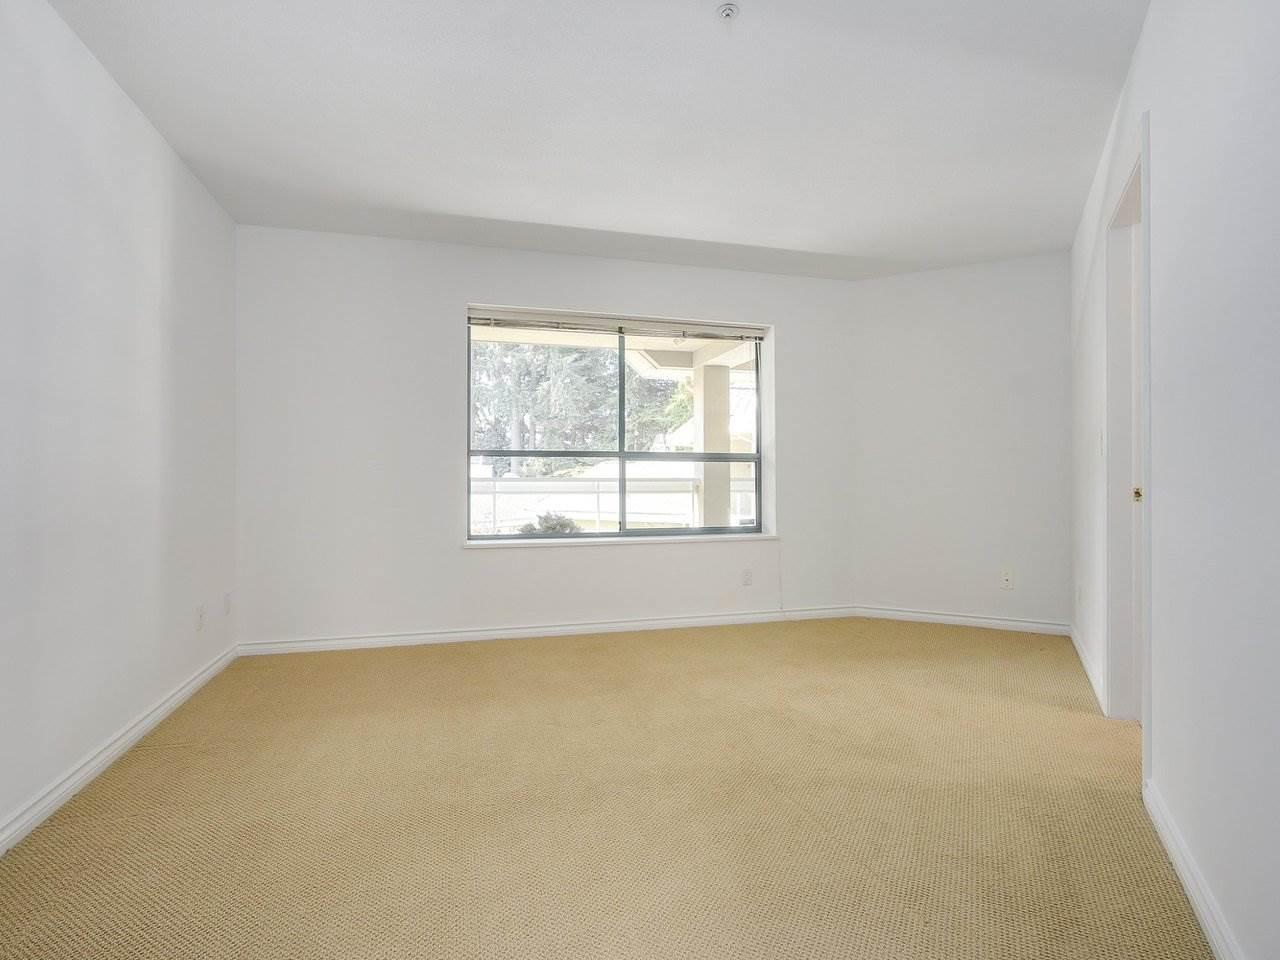 Condo Apartment at 304 3288 CAPILANO CRESCENT, Unit 304, North Vancouver, British Columbia. Image 16